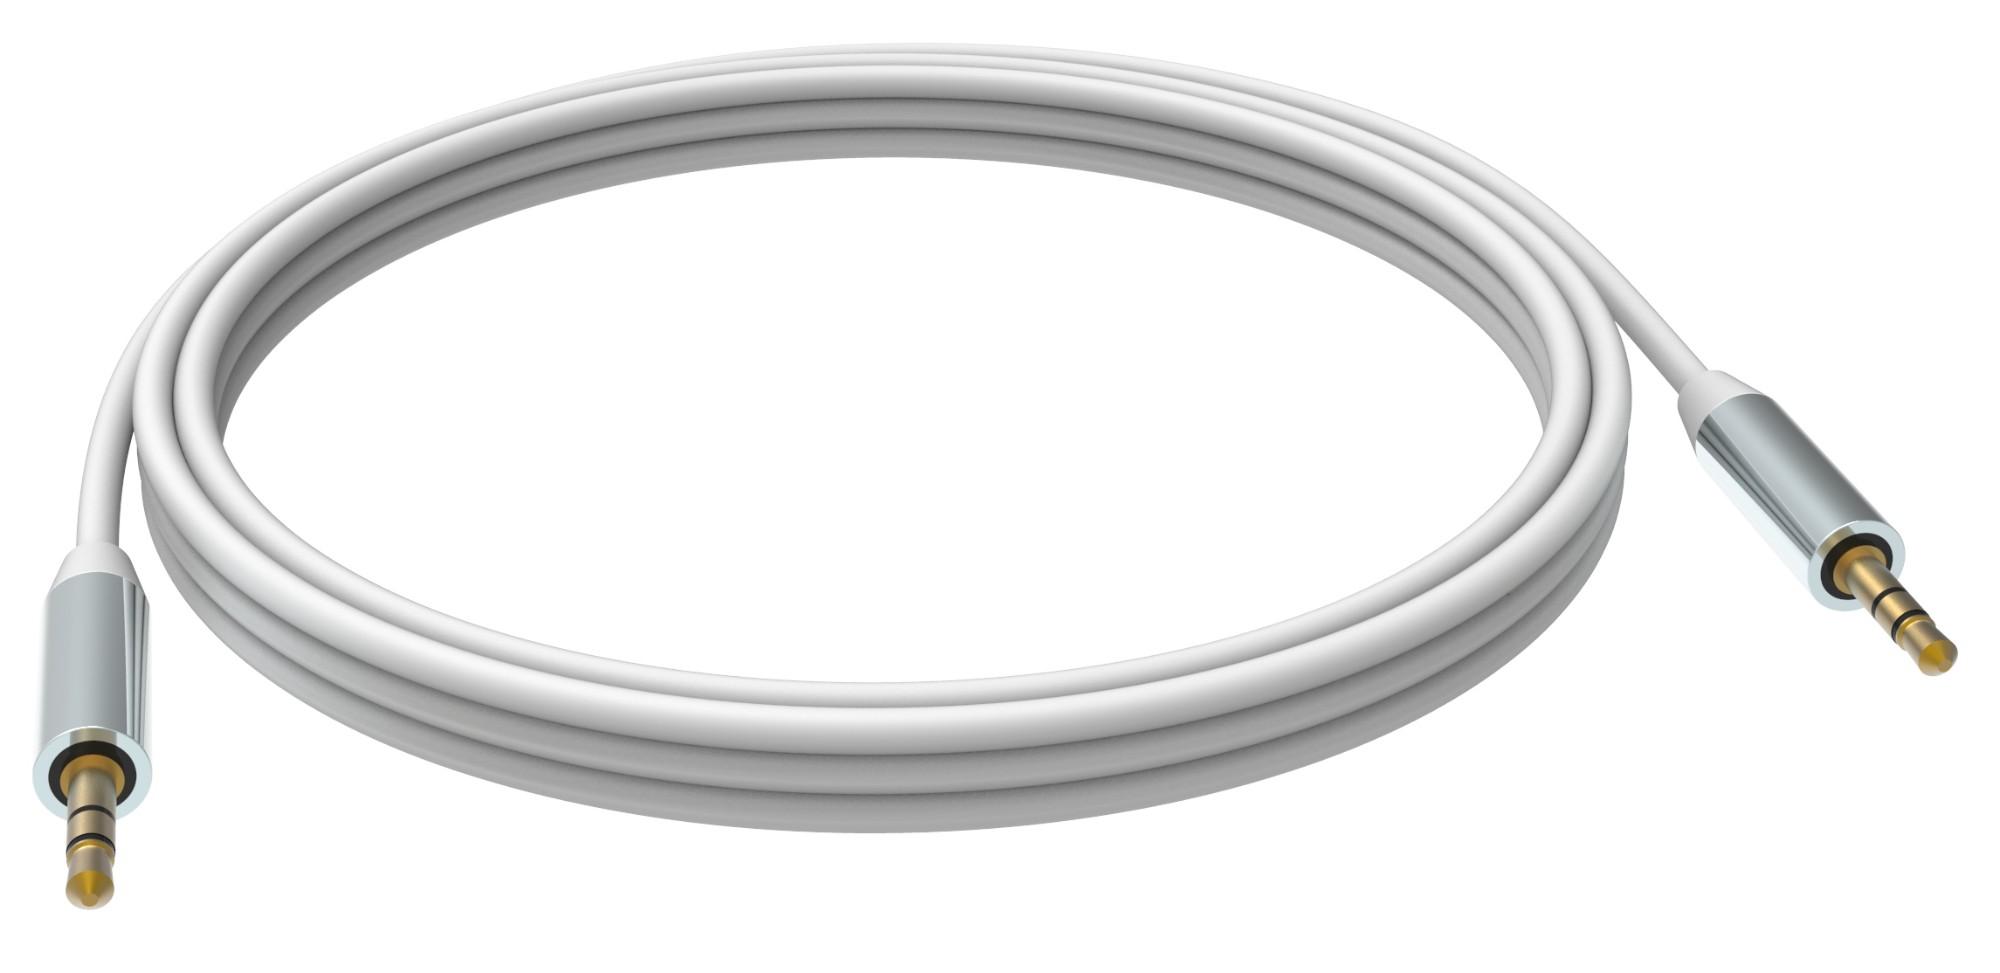 0.5m Minijack Cable